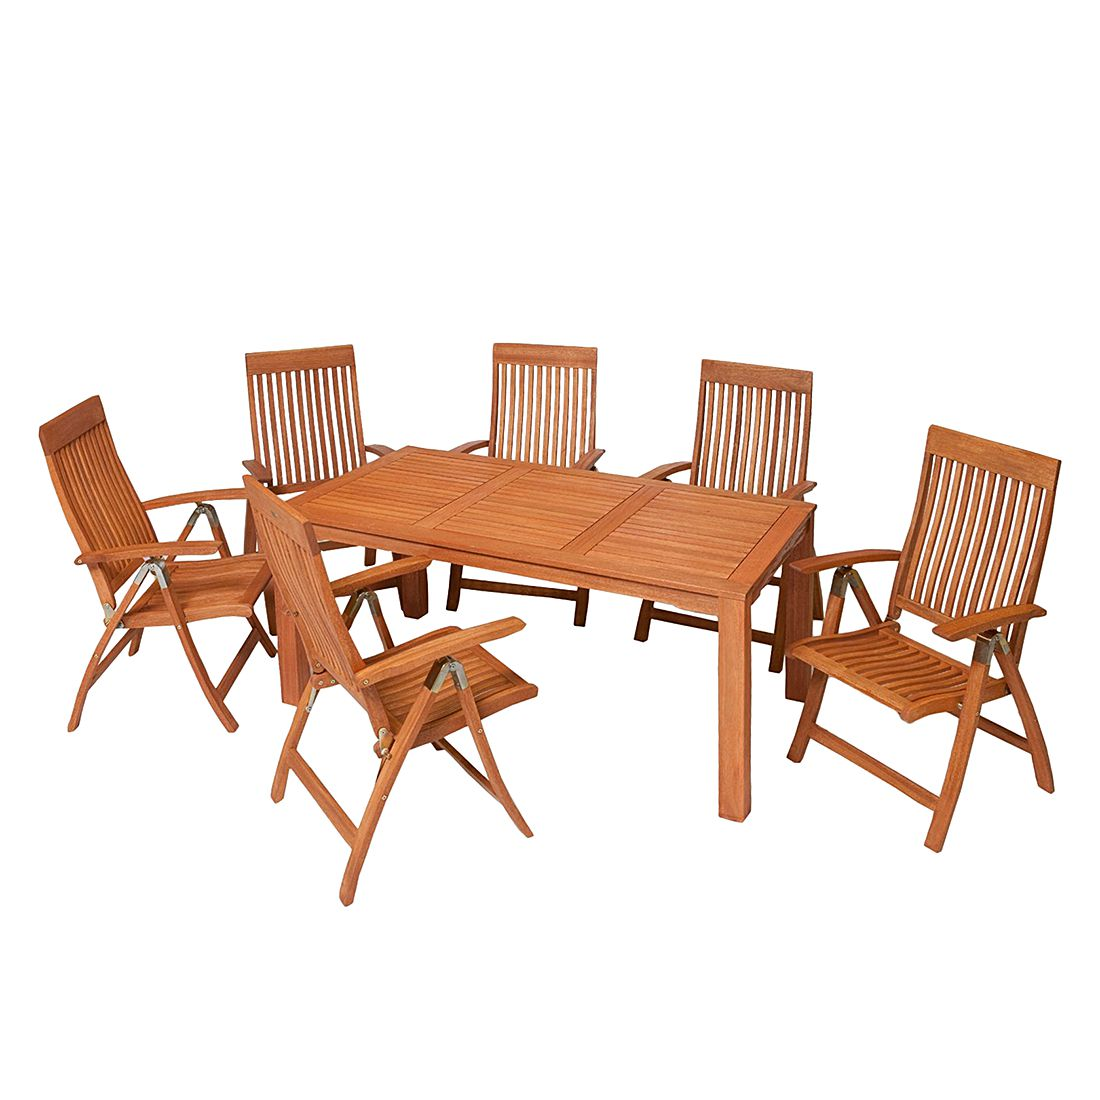 gartensitzgruppe comodoro 7 teilig eukalyptus merxx jetzt kaufen. Black Bedroom Furniture Sets. Home Design Ideas